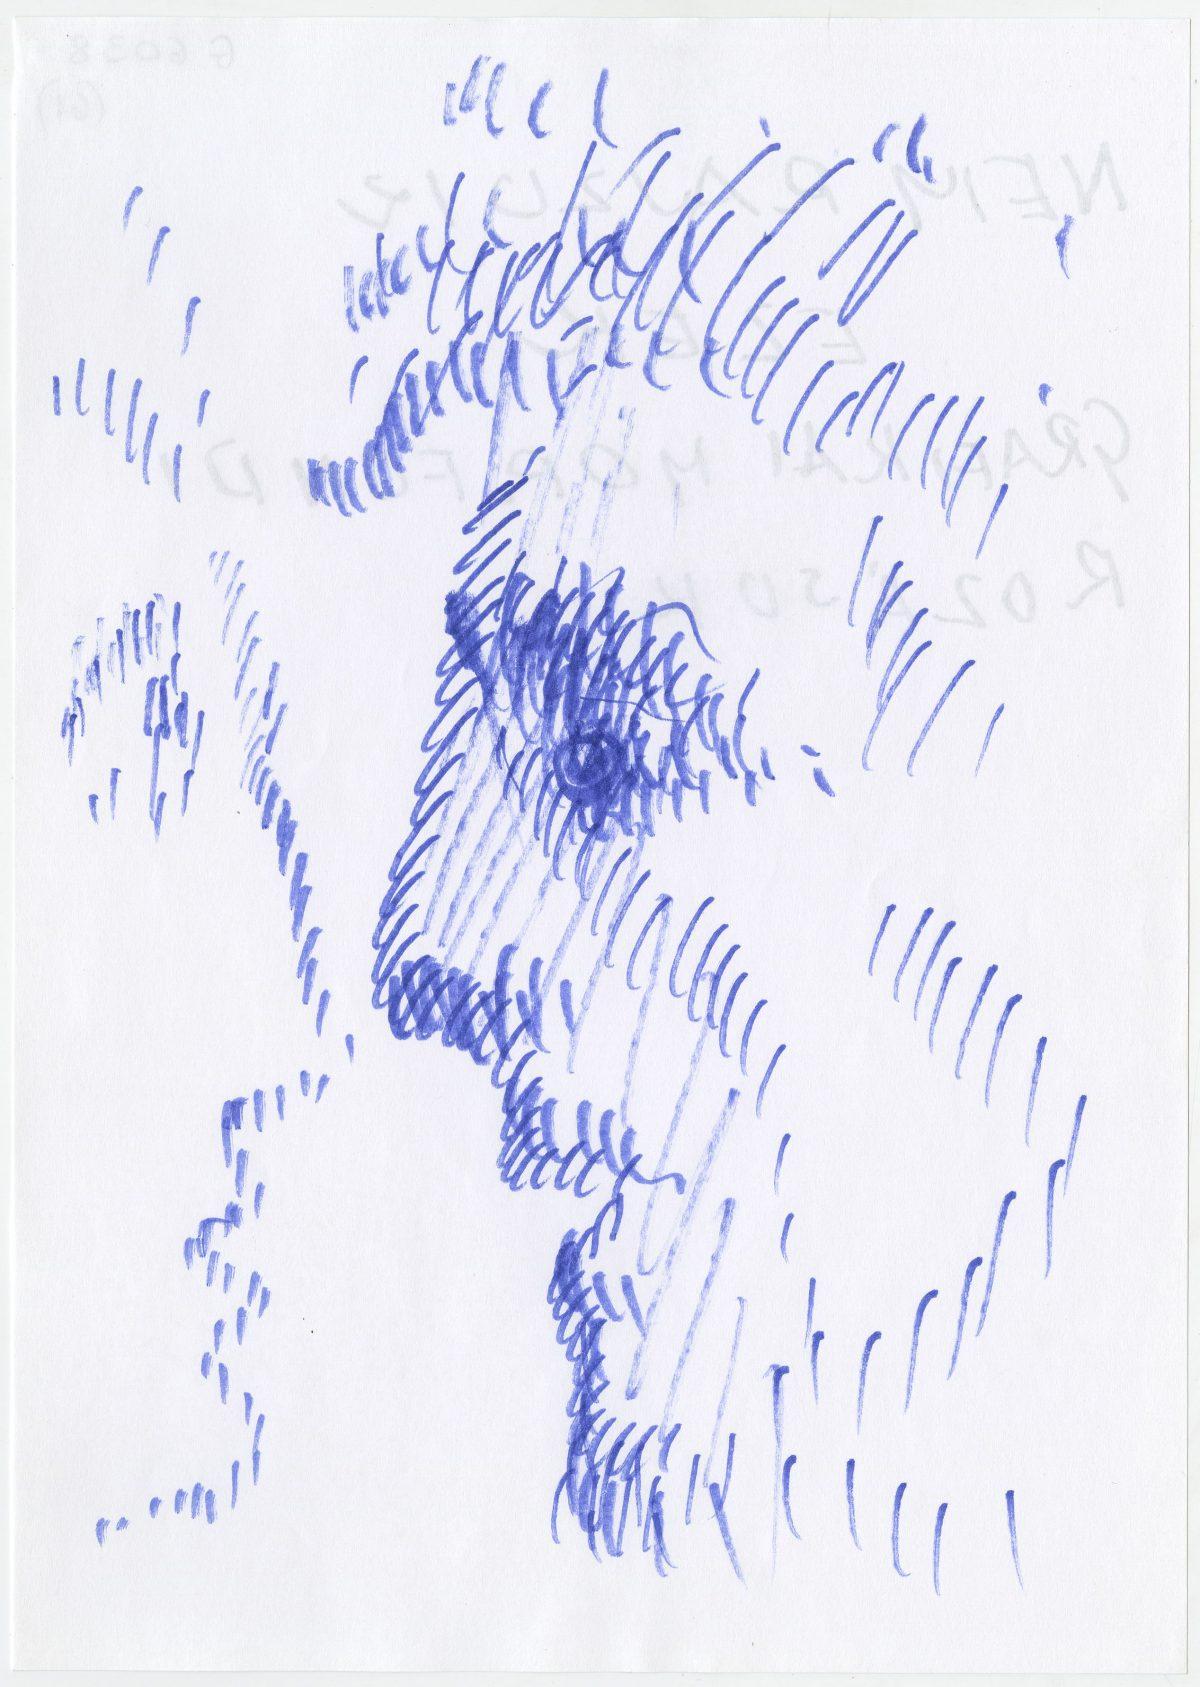 G06038(61)<br/> <b>Cím:</b> Ma éjjel ezt … ; Nem rajzok ezek grafikai … <br/> <b>Méret cm:</b> 29,6X21 <br/> <b>Készült:</b> 2002. <br/> <b>Technika:</b> filc<br/>